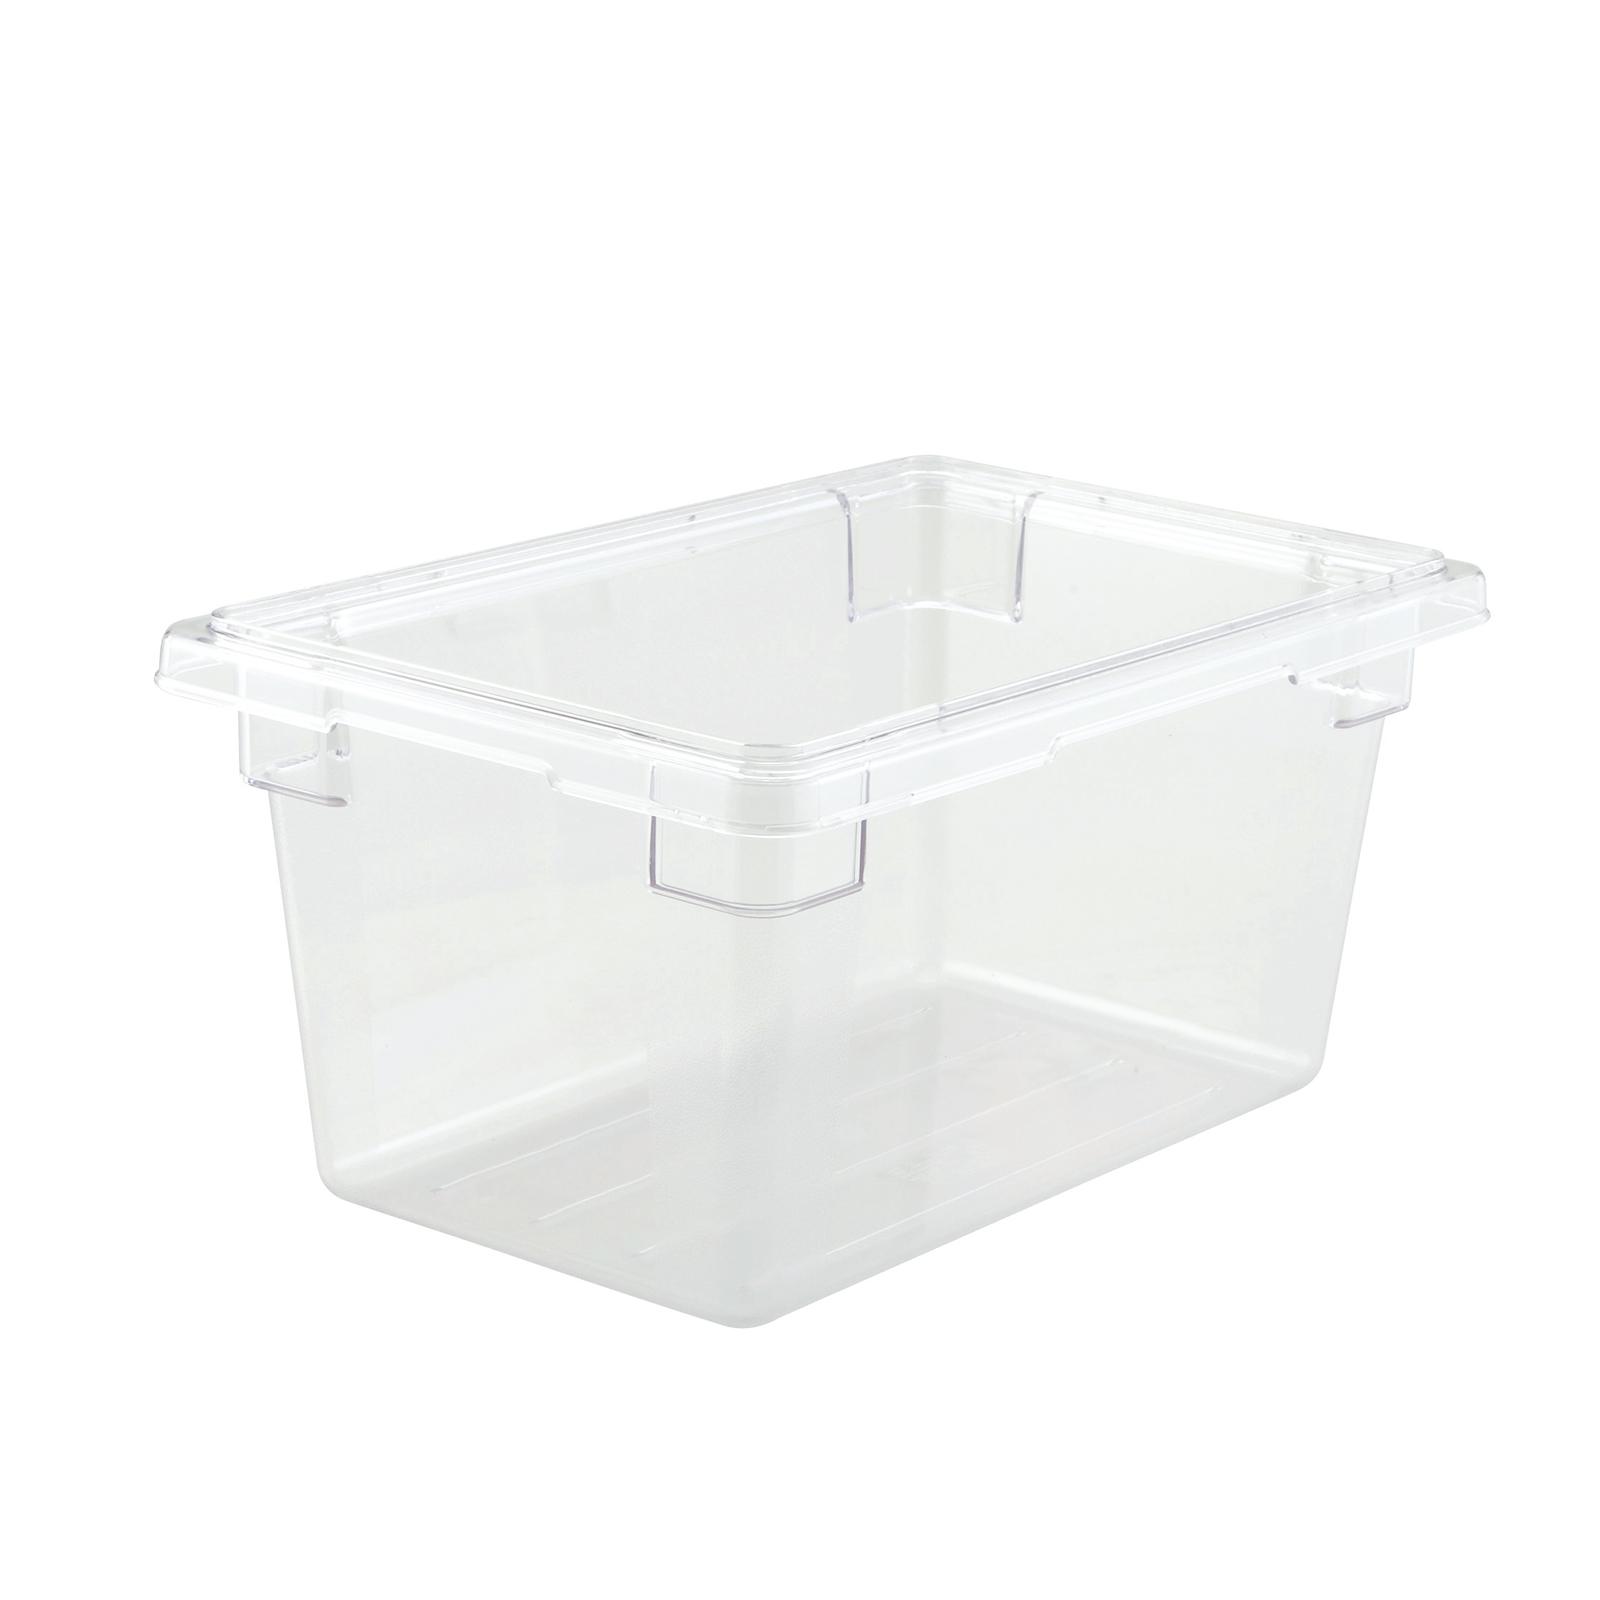 2700-813 Winco PFSH-9 food storage container, box